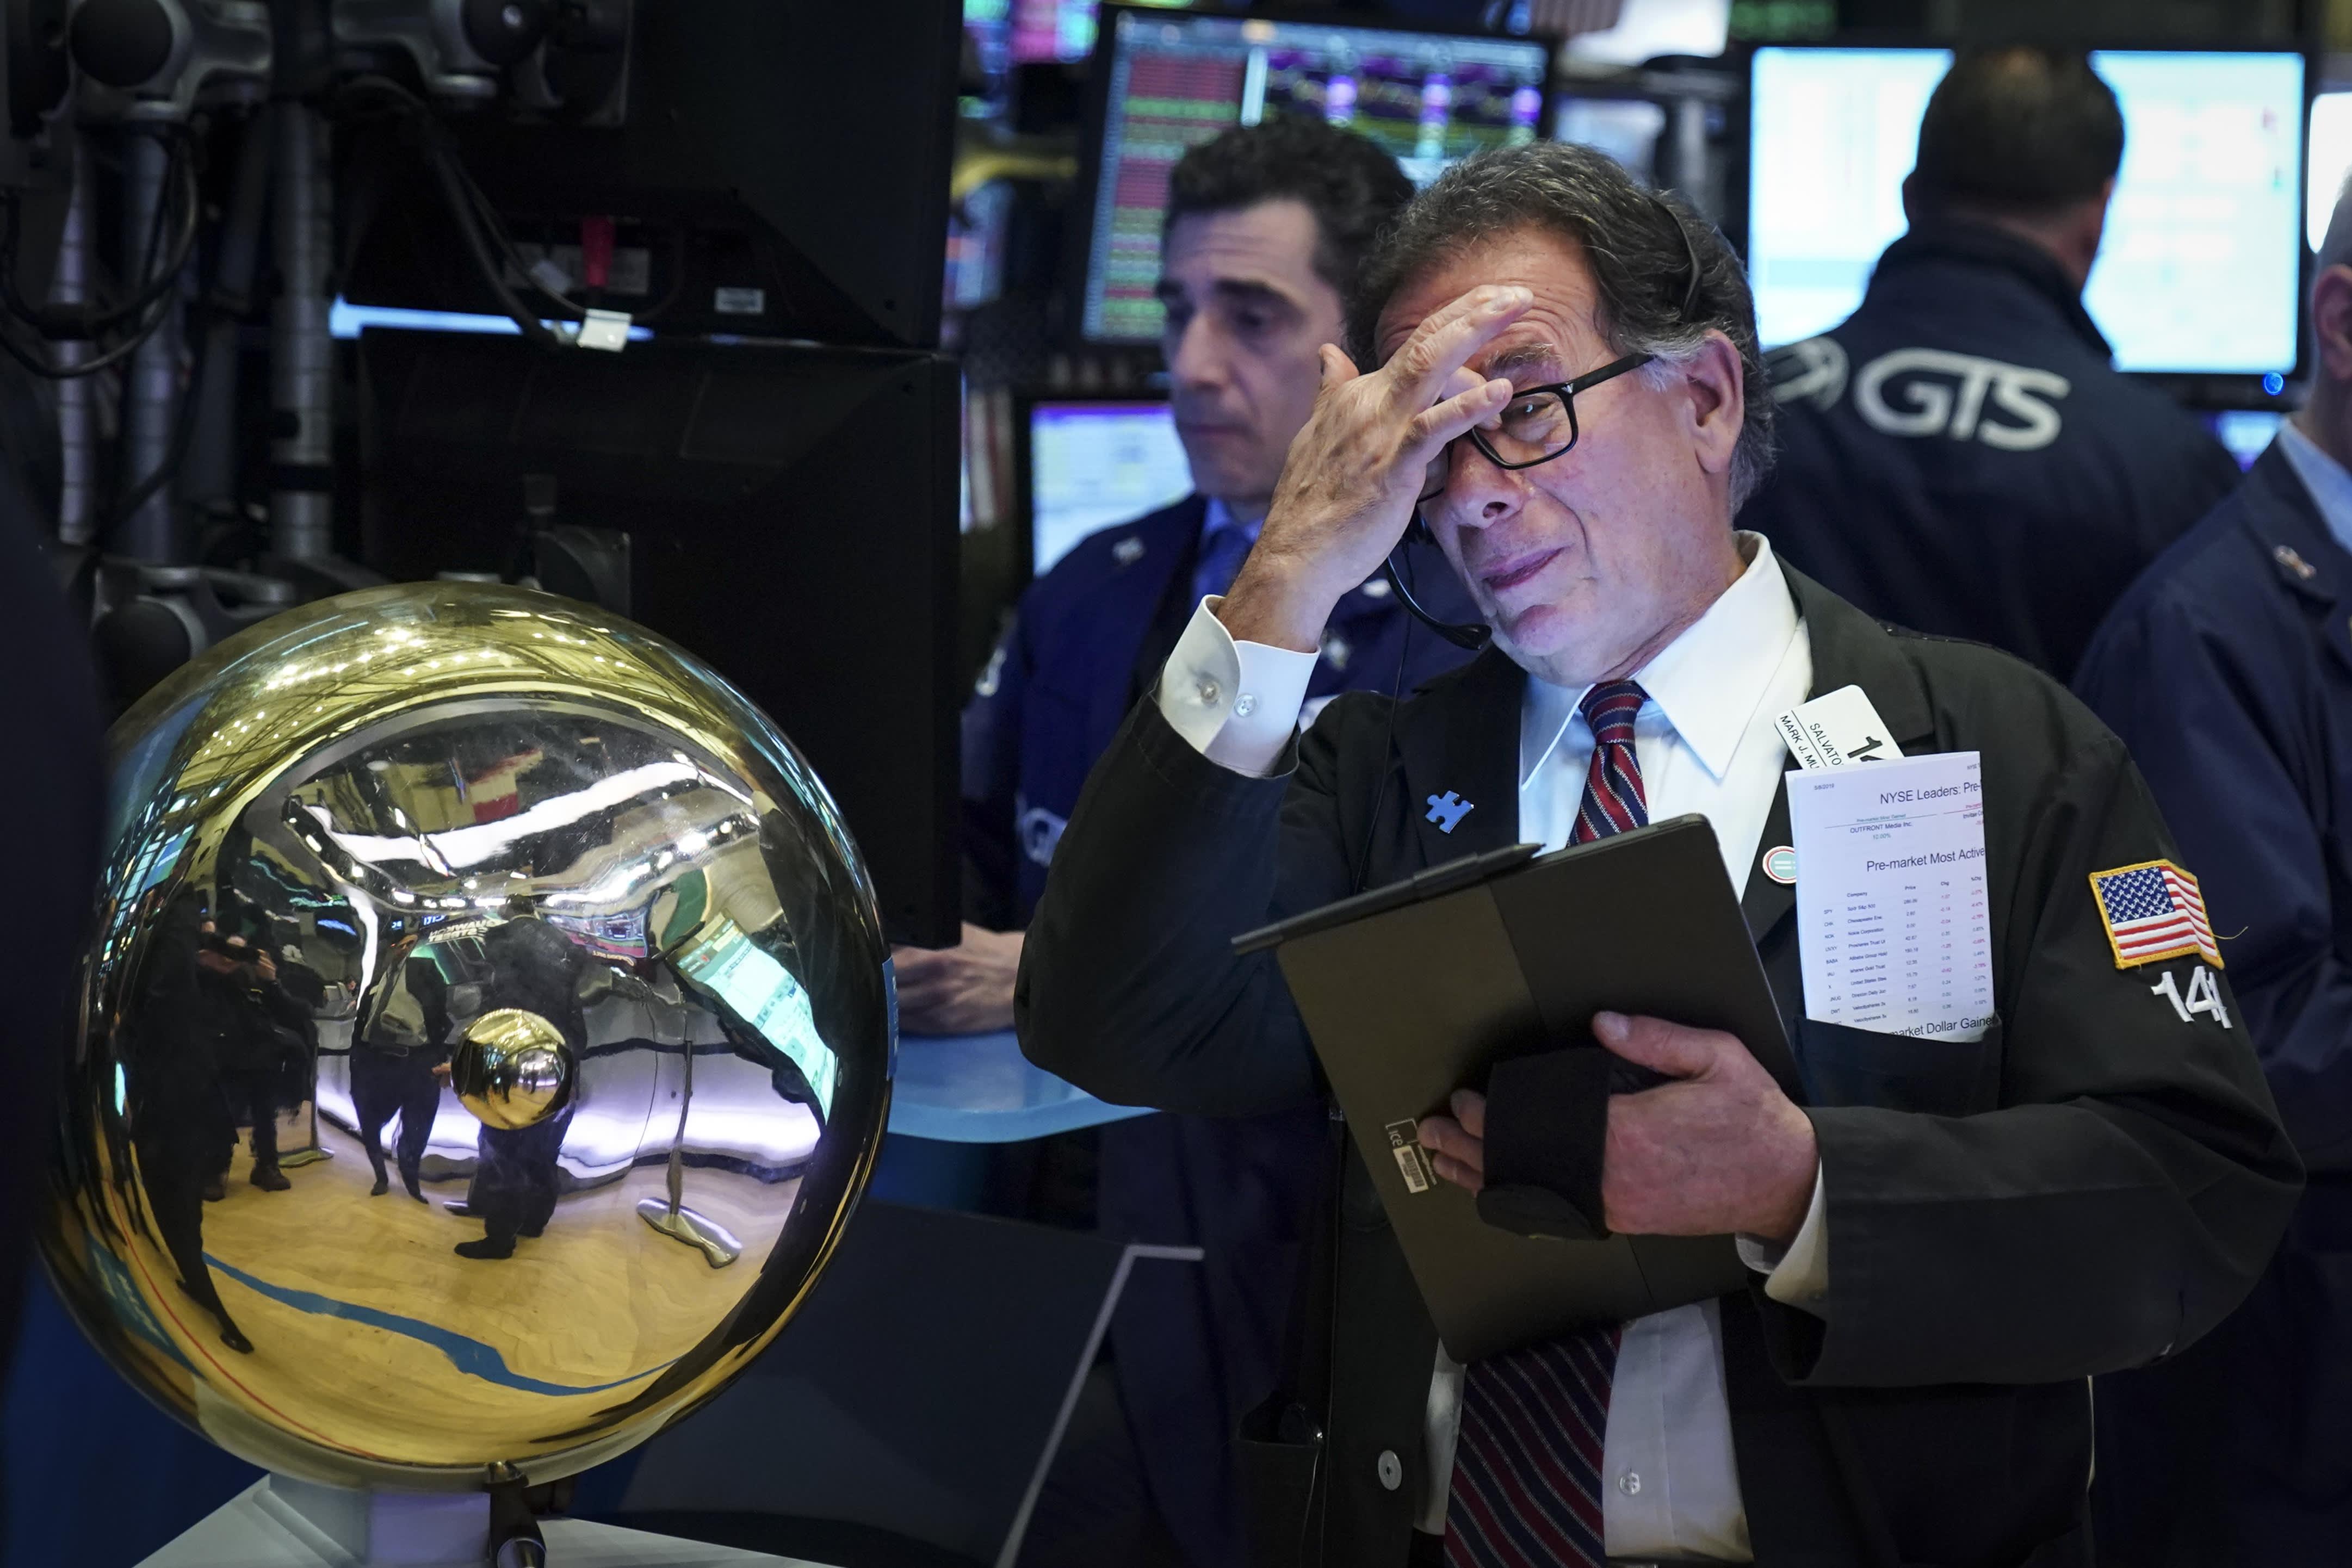 Stocks making the biggest moves premarket: Walmart, Pfizer, PG&E, Sony, Tesla & more